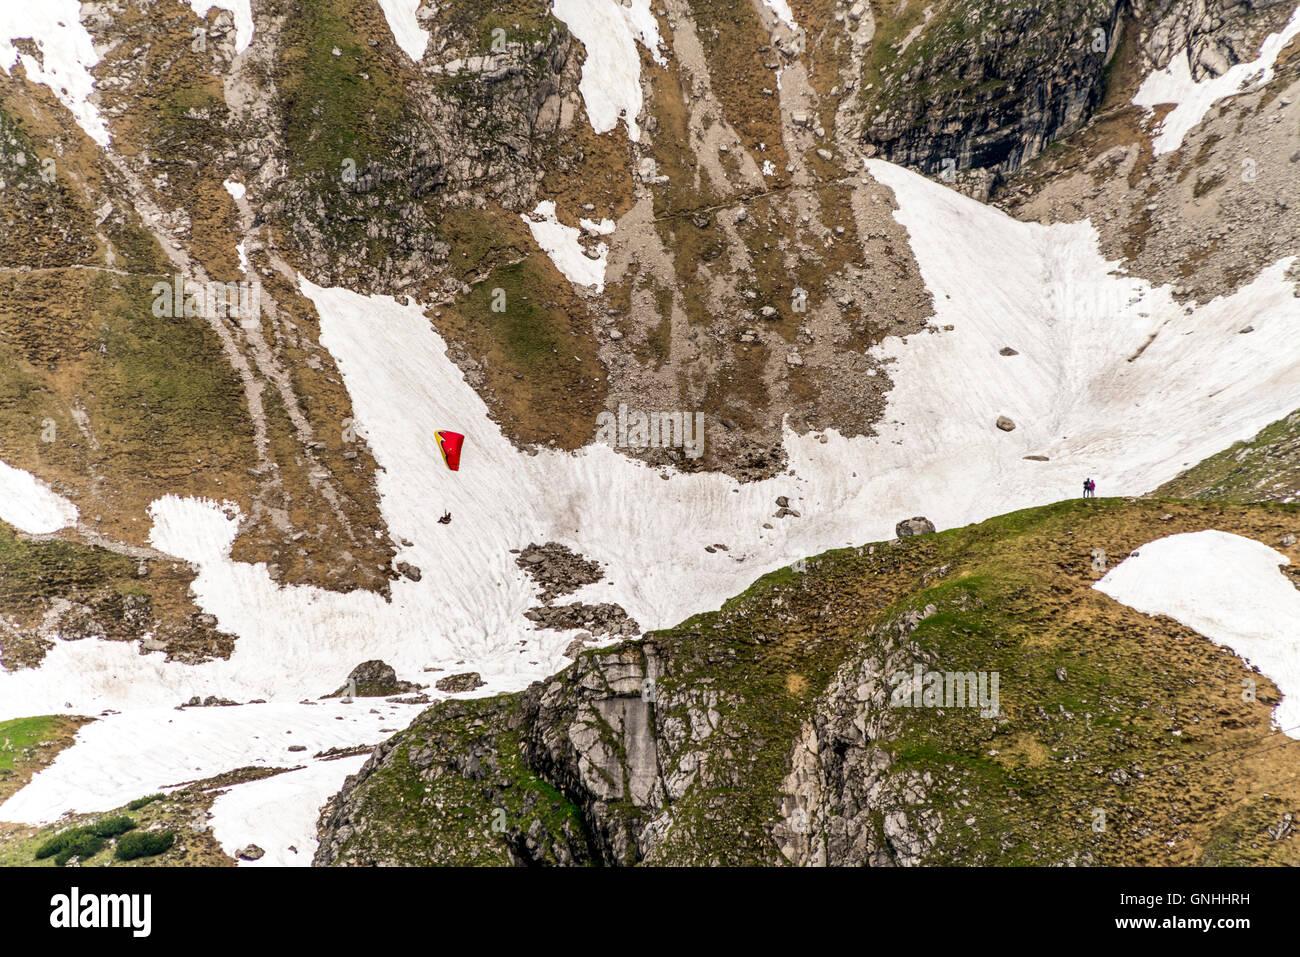 hiker and Paraglider in the Allgäu Alps near Oberstdorf, Oberallgäu, Bavaria, Germany Stock Photo